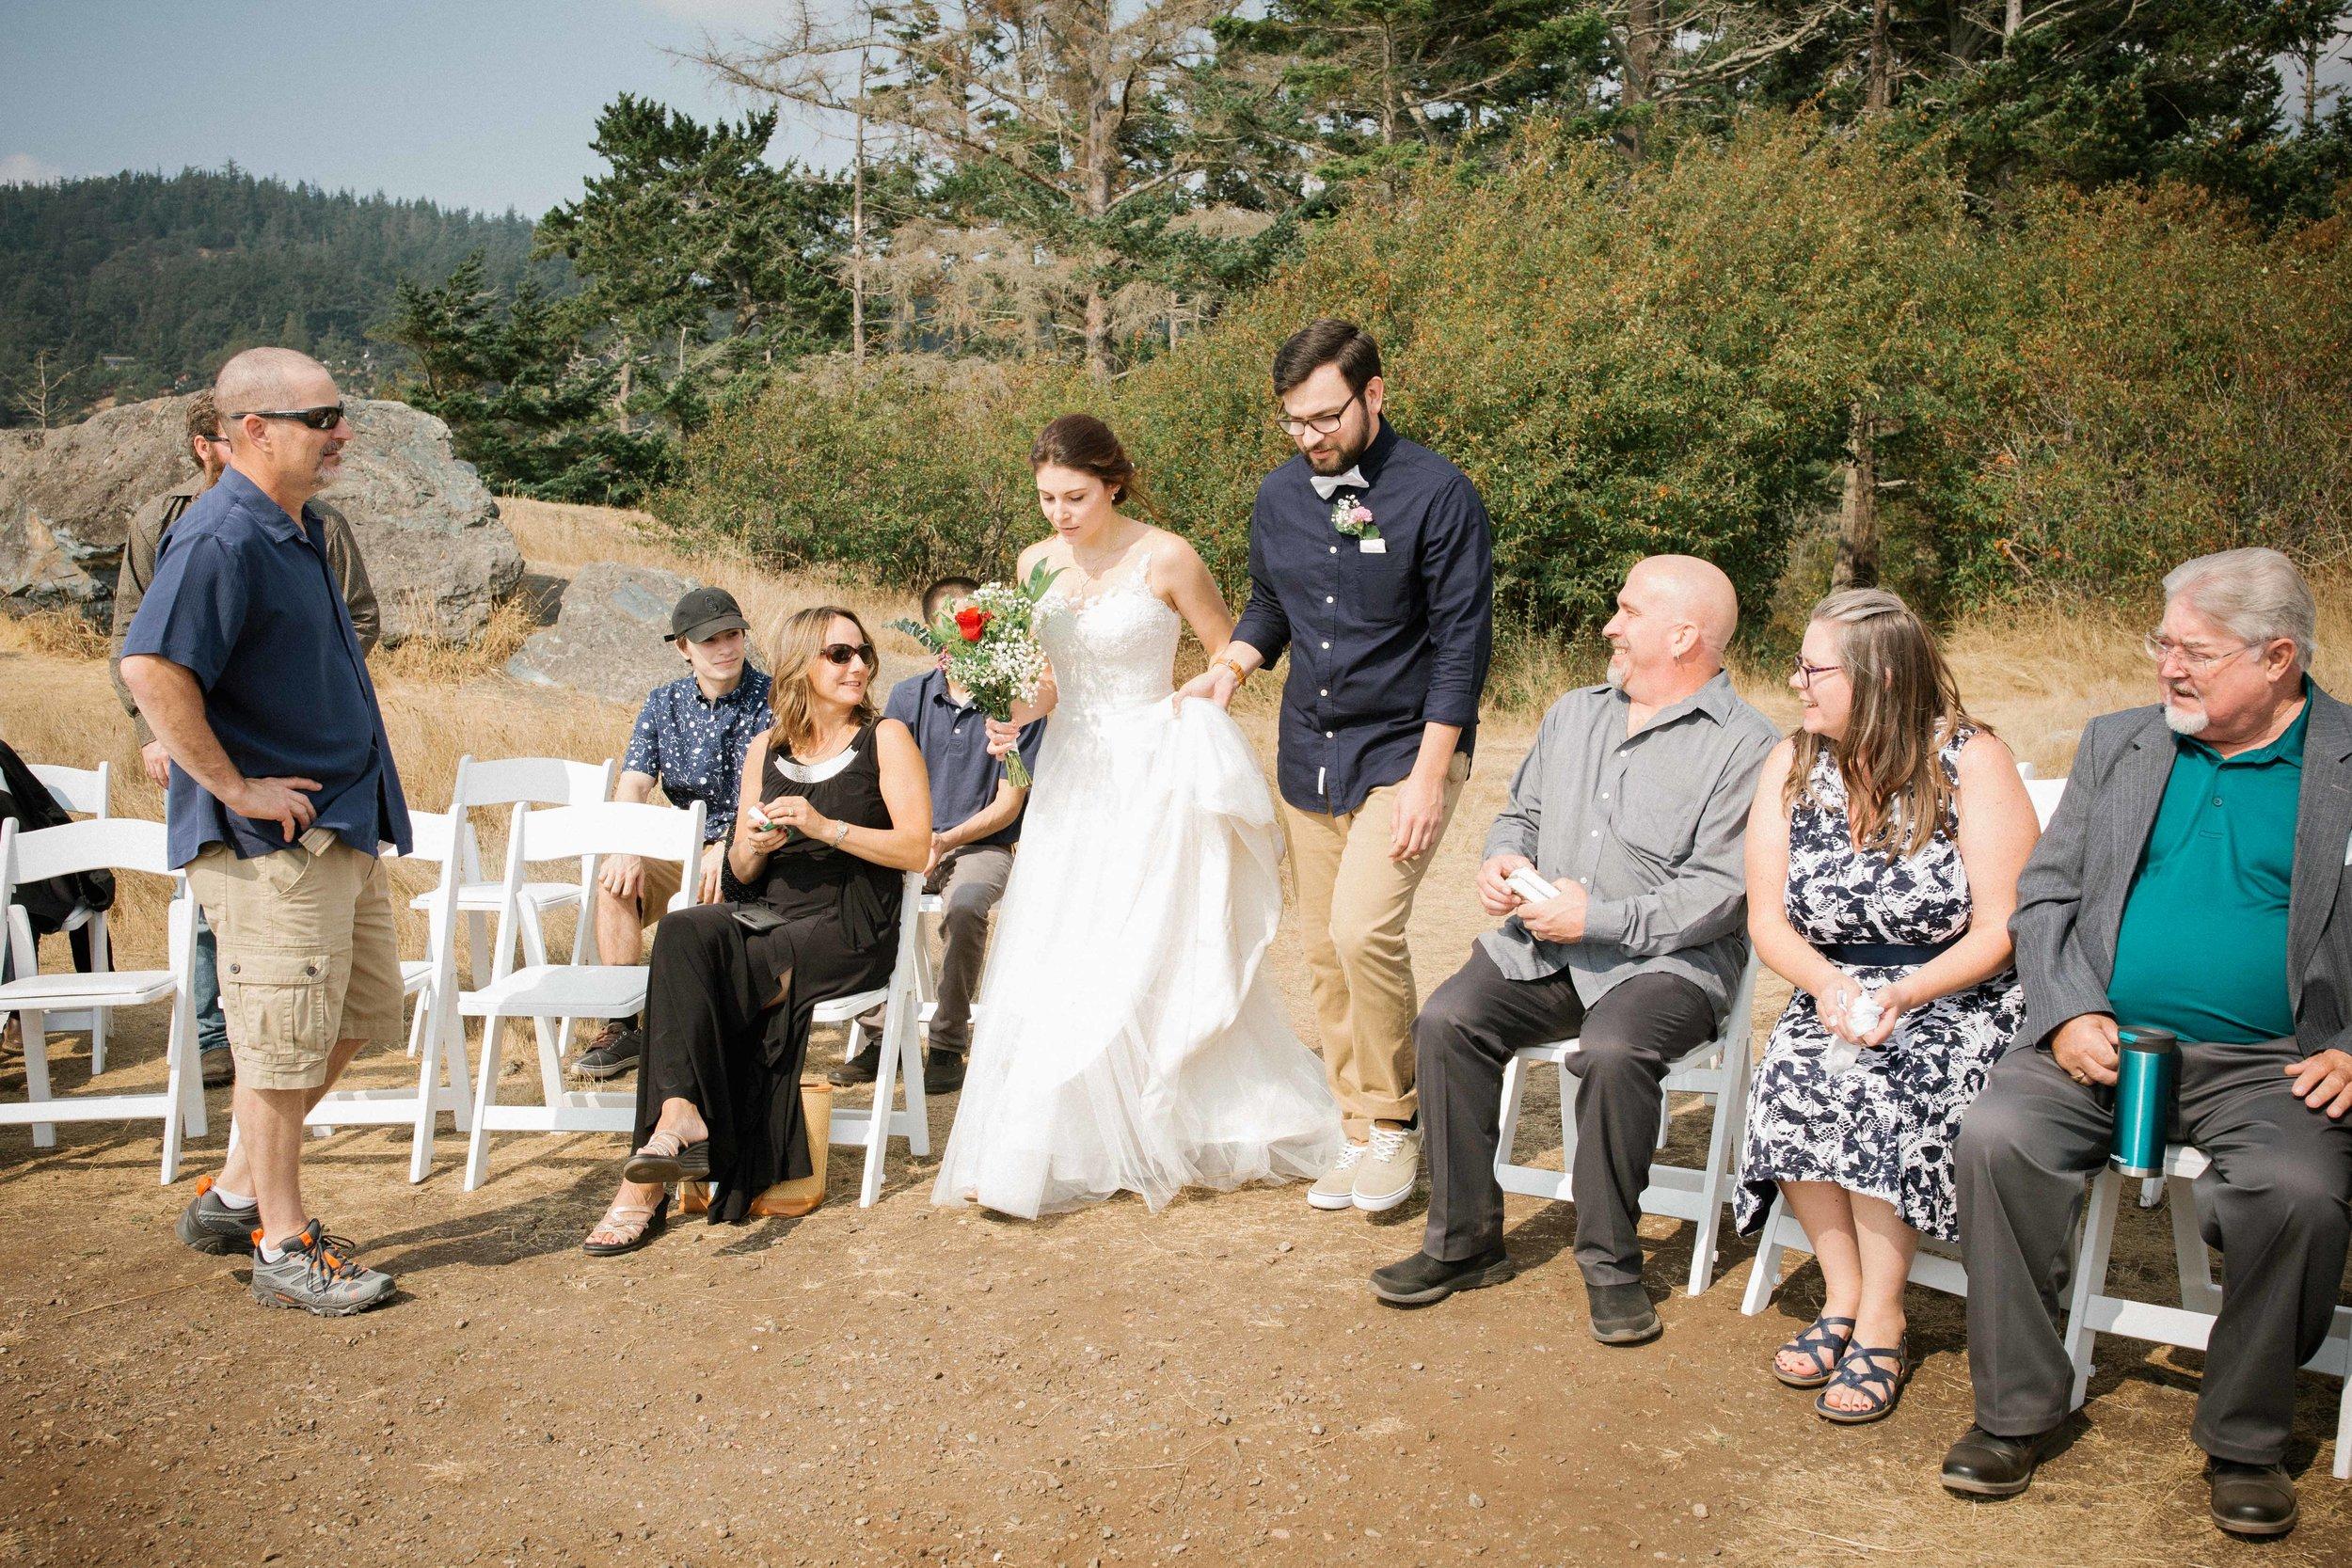 deception-pass-wedding-28.jpg